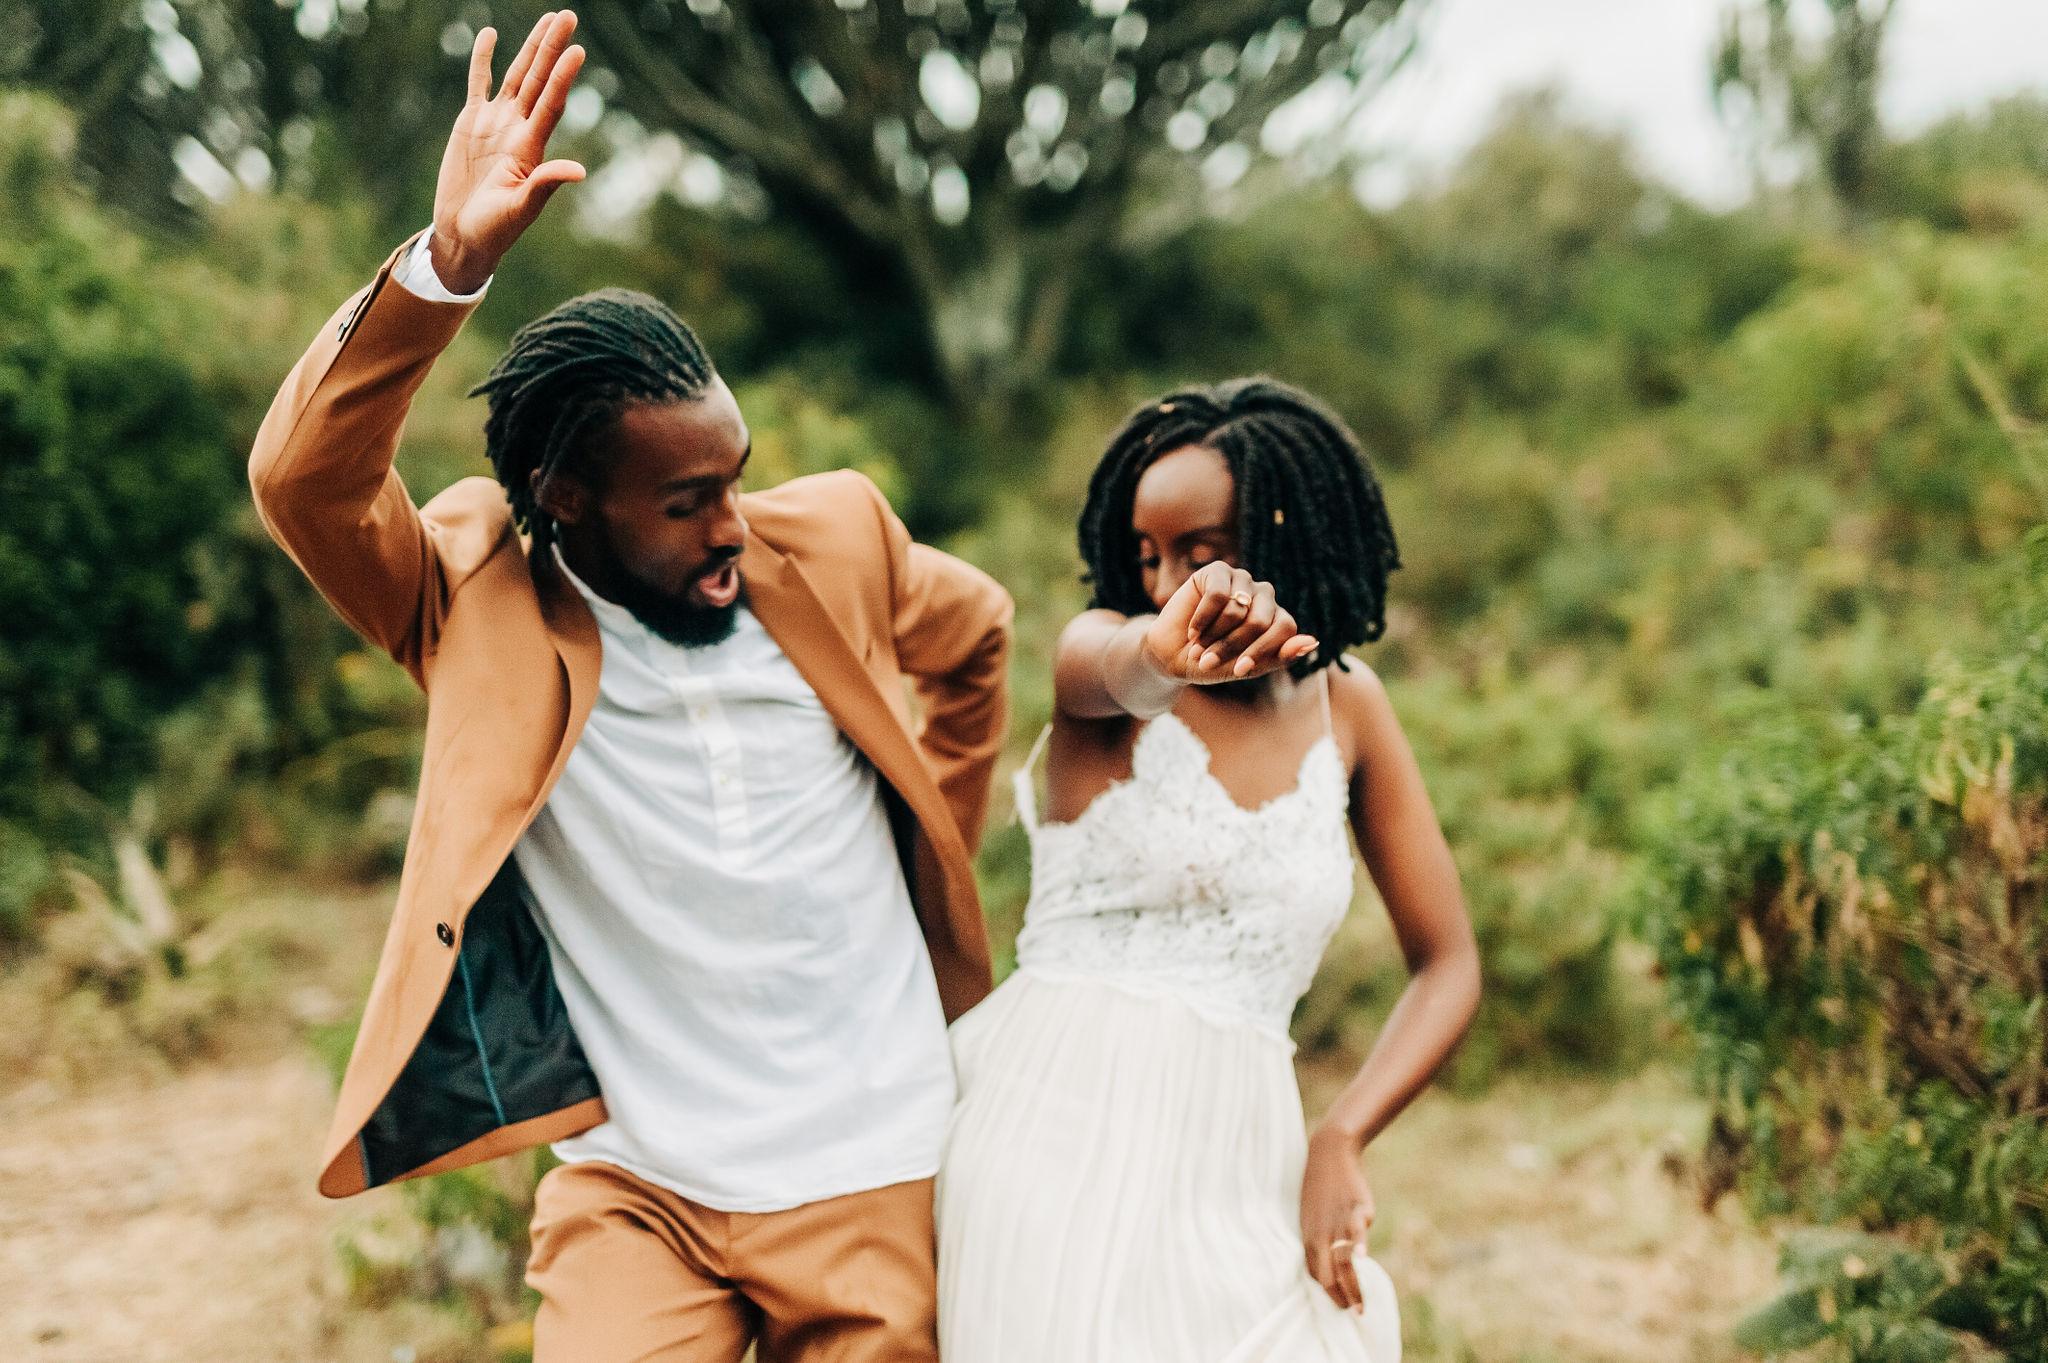 Anna-Hari-Photography-Destination-Wedding-Photographer-Kenya-273.jpg